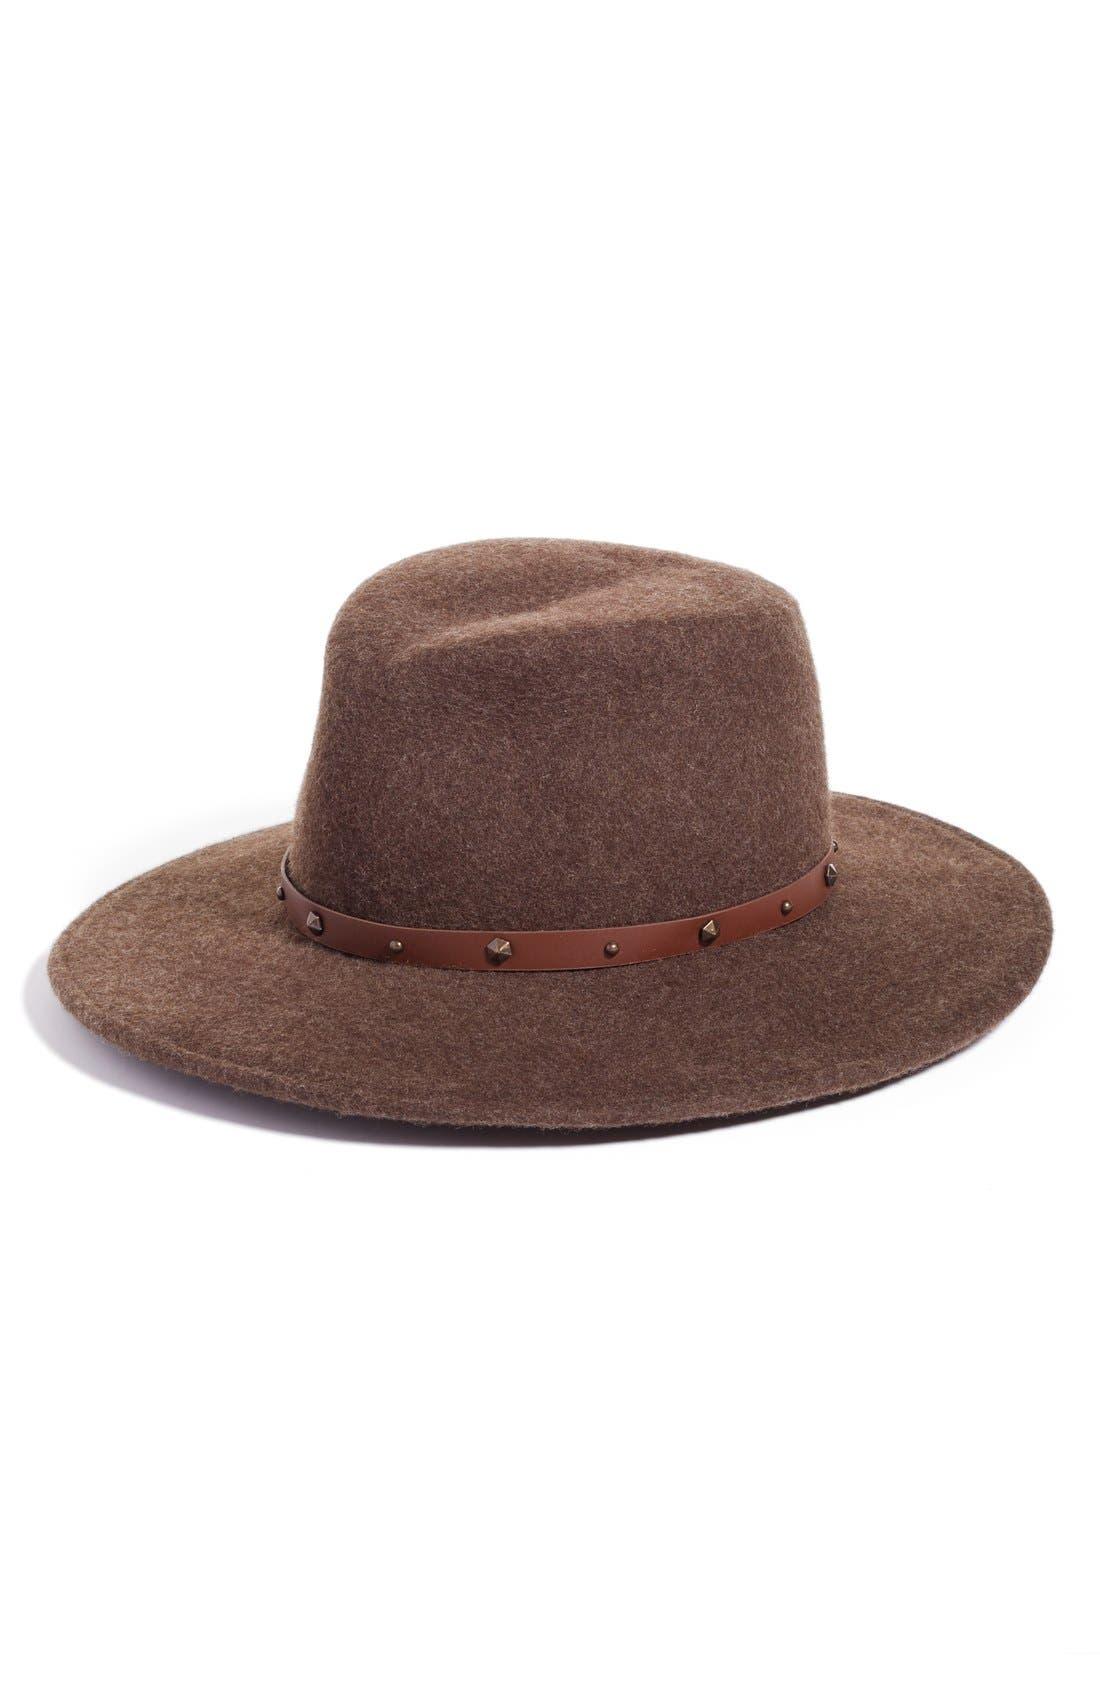 Karli Wool Felt Wide Brim Hat,                             Main thumbnail 1, color,                             Brown Mix